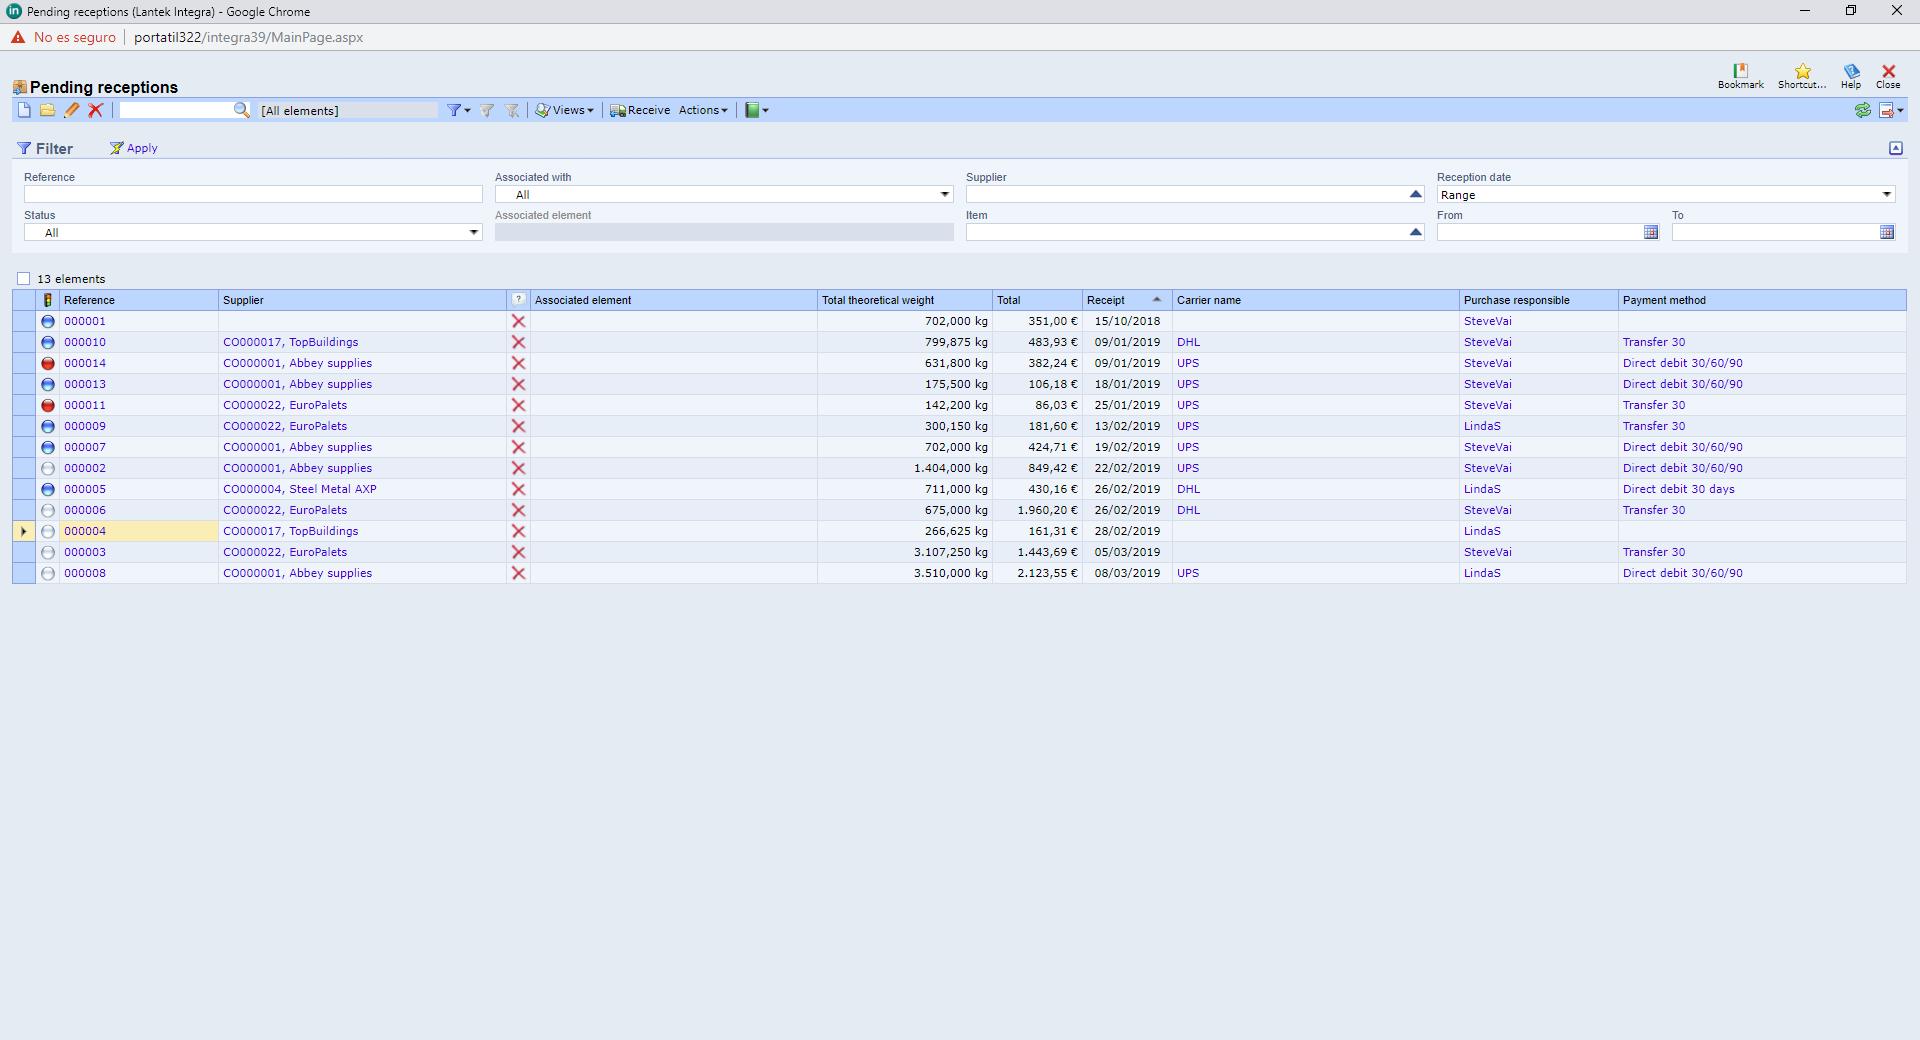 Lantek integra Inventory  - Reçus en attente